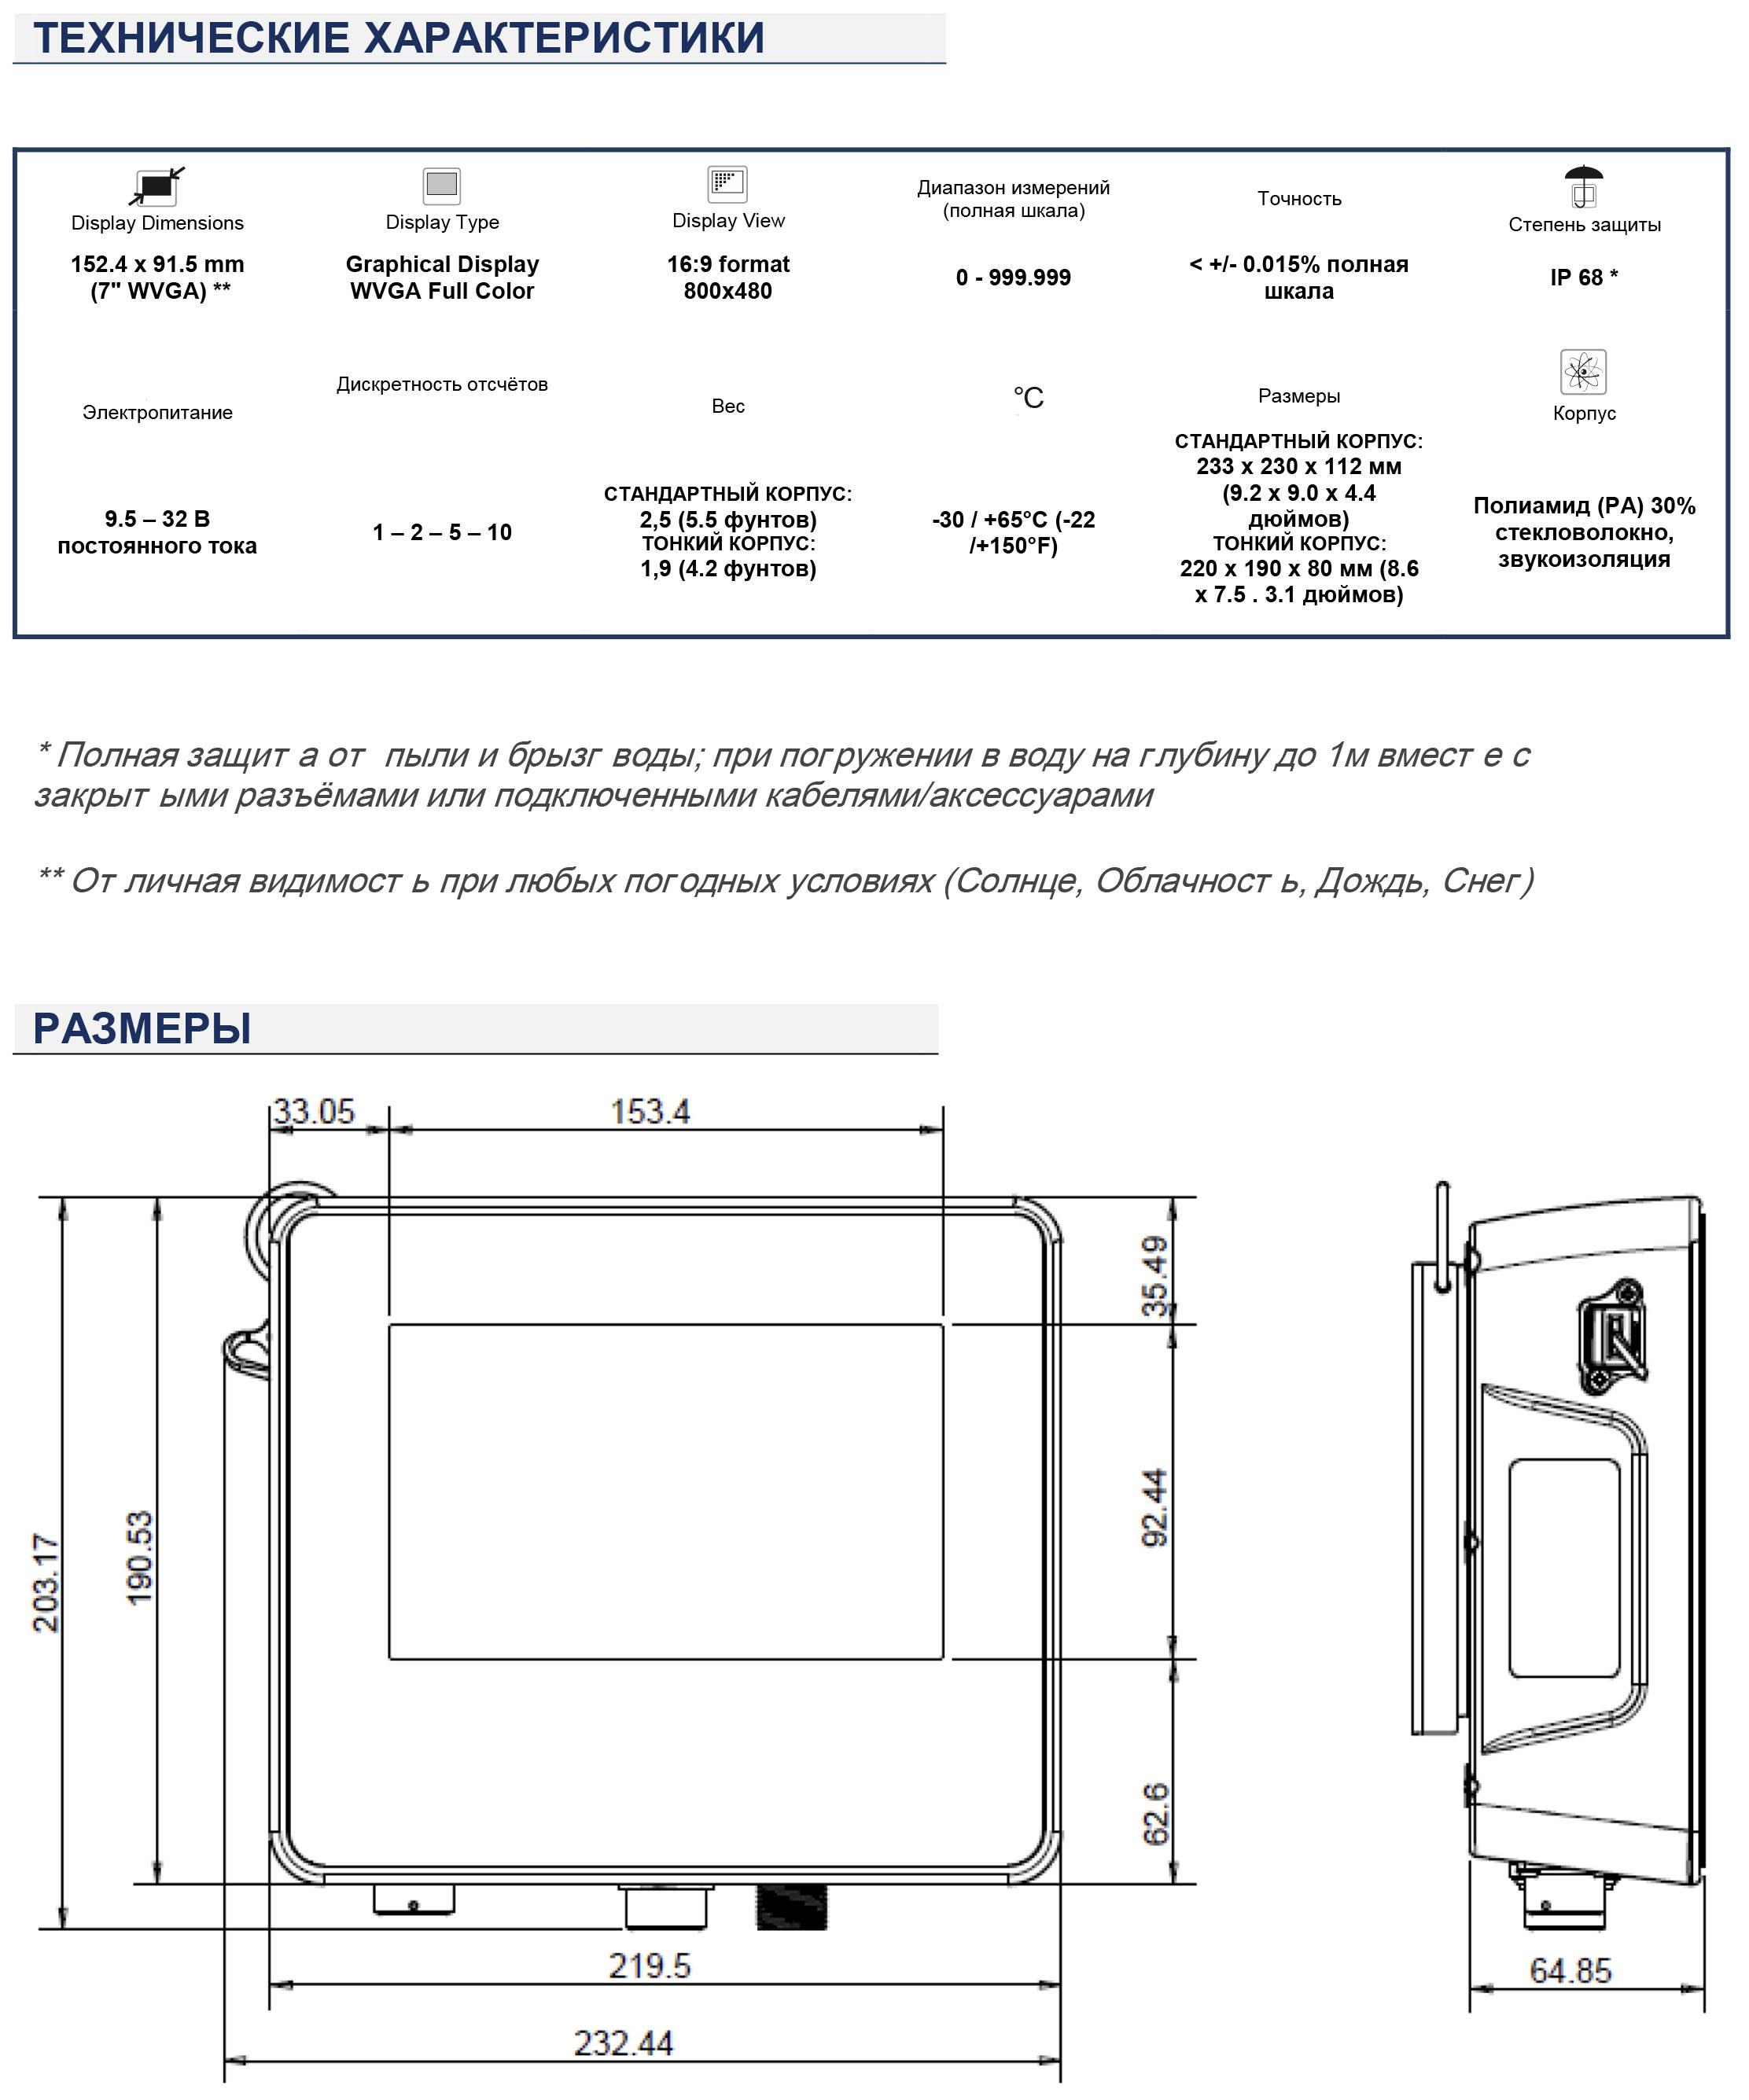 DG8000-IC/SB C ПО DTM И 3G  dg8000ic_technicalsh-1-2